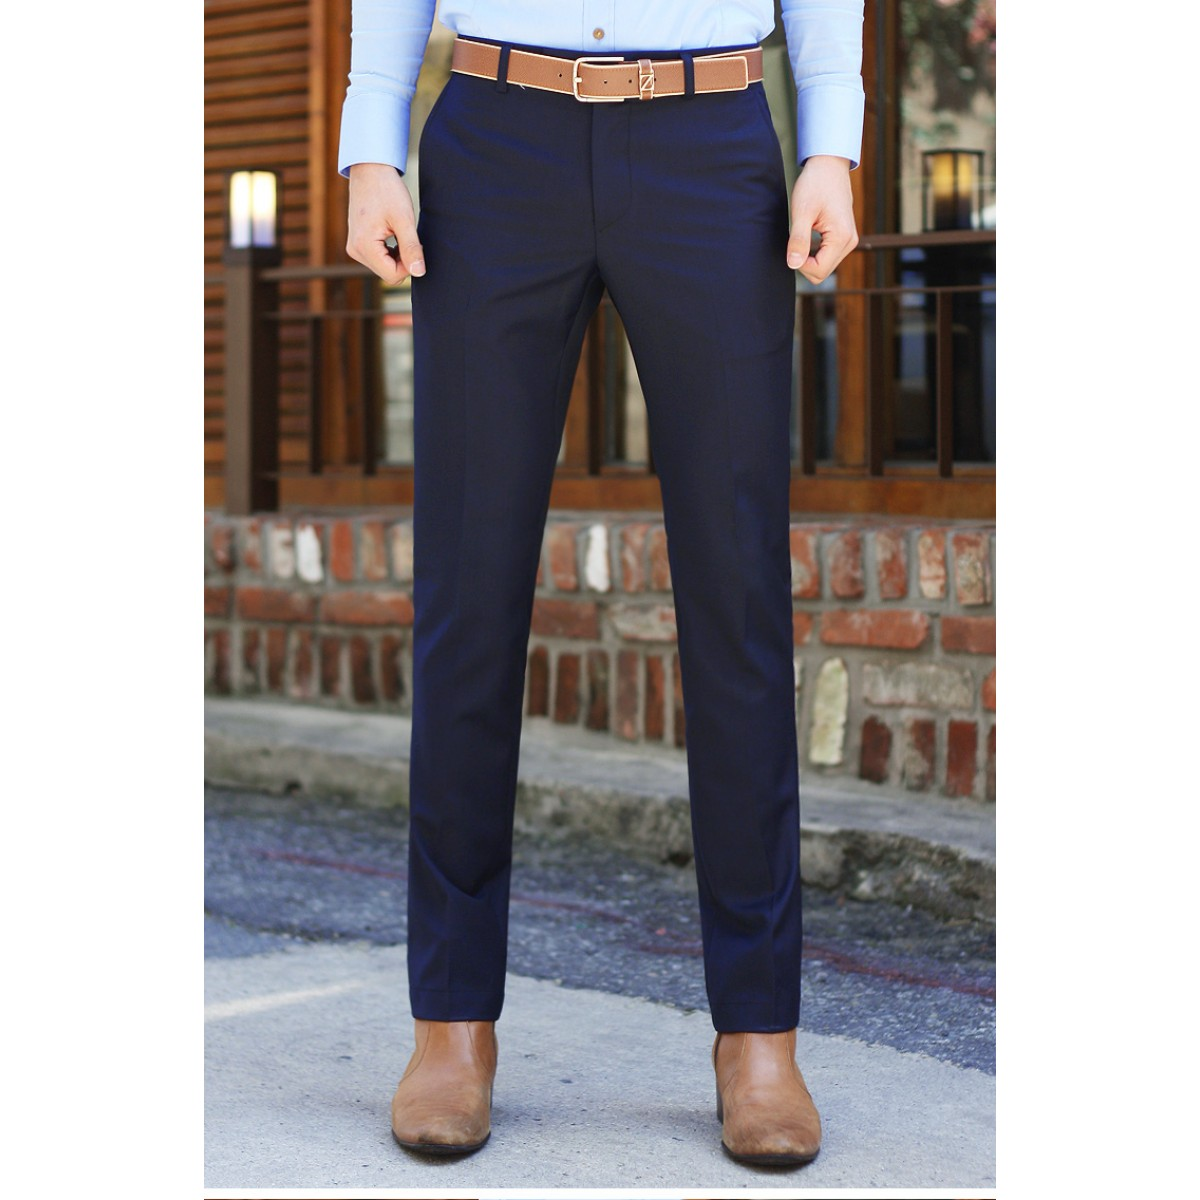 pantalon homme classe pantalon pantalon sport en molleton. Black Bedroom Furniture Sets. Home Design Ideas